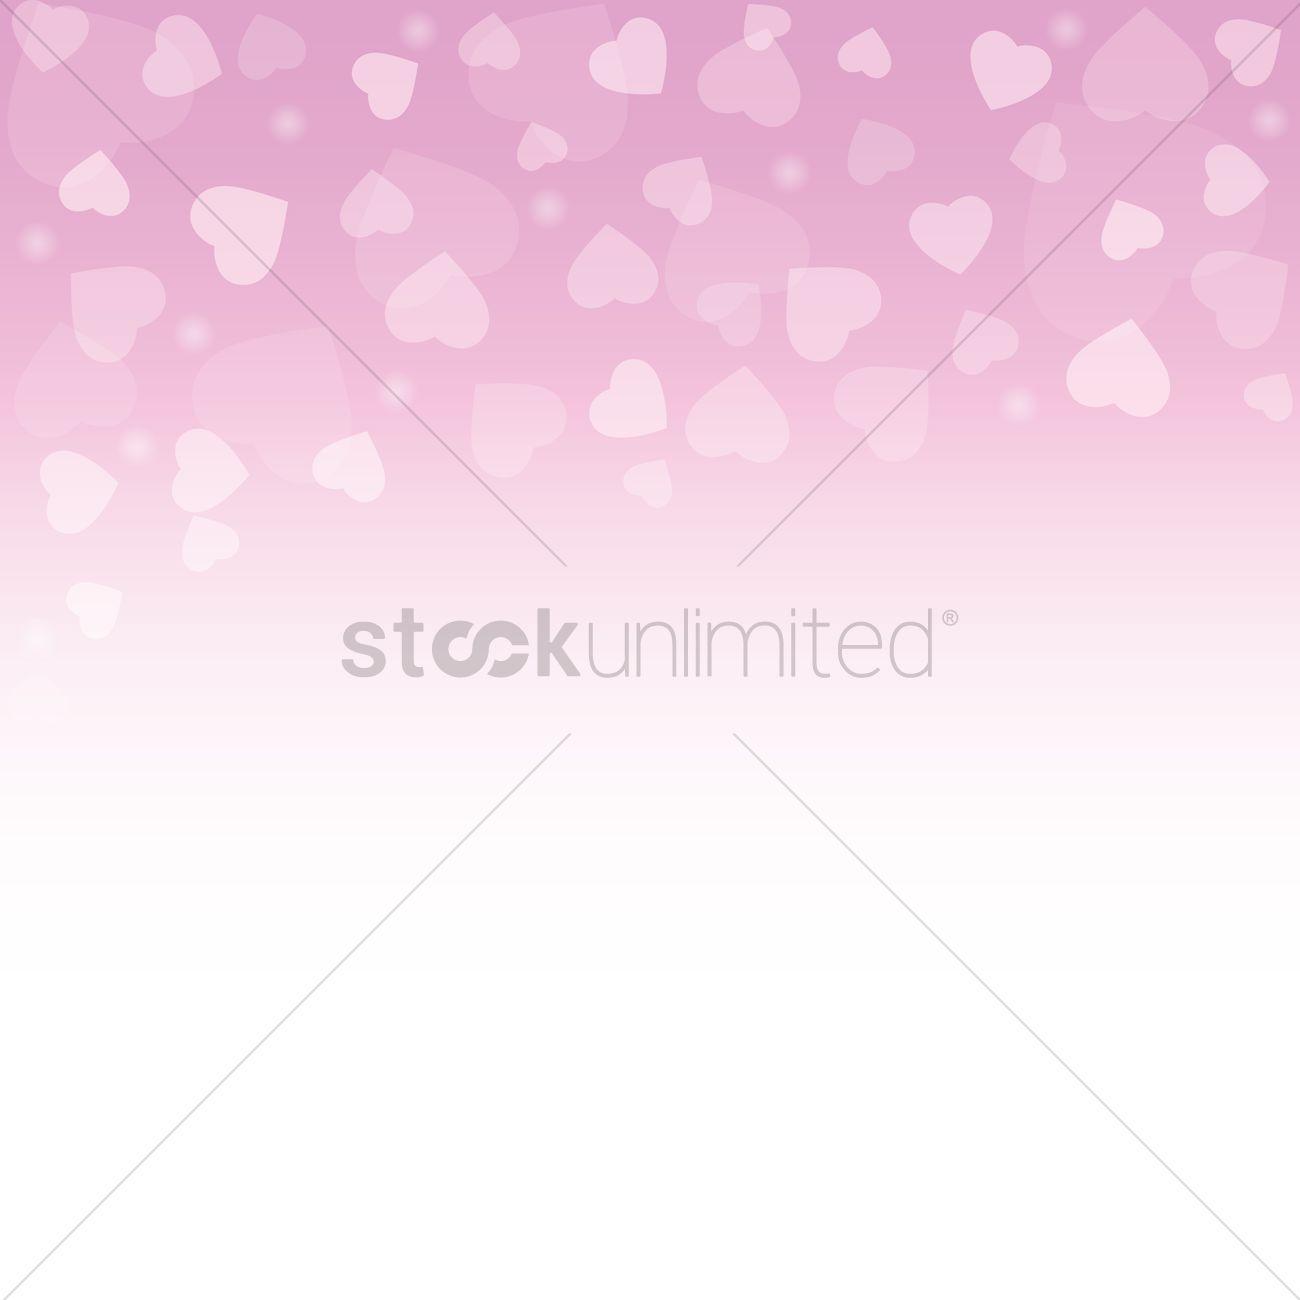 Love Wallpaper Vector Image 1713145 Stockunlimited